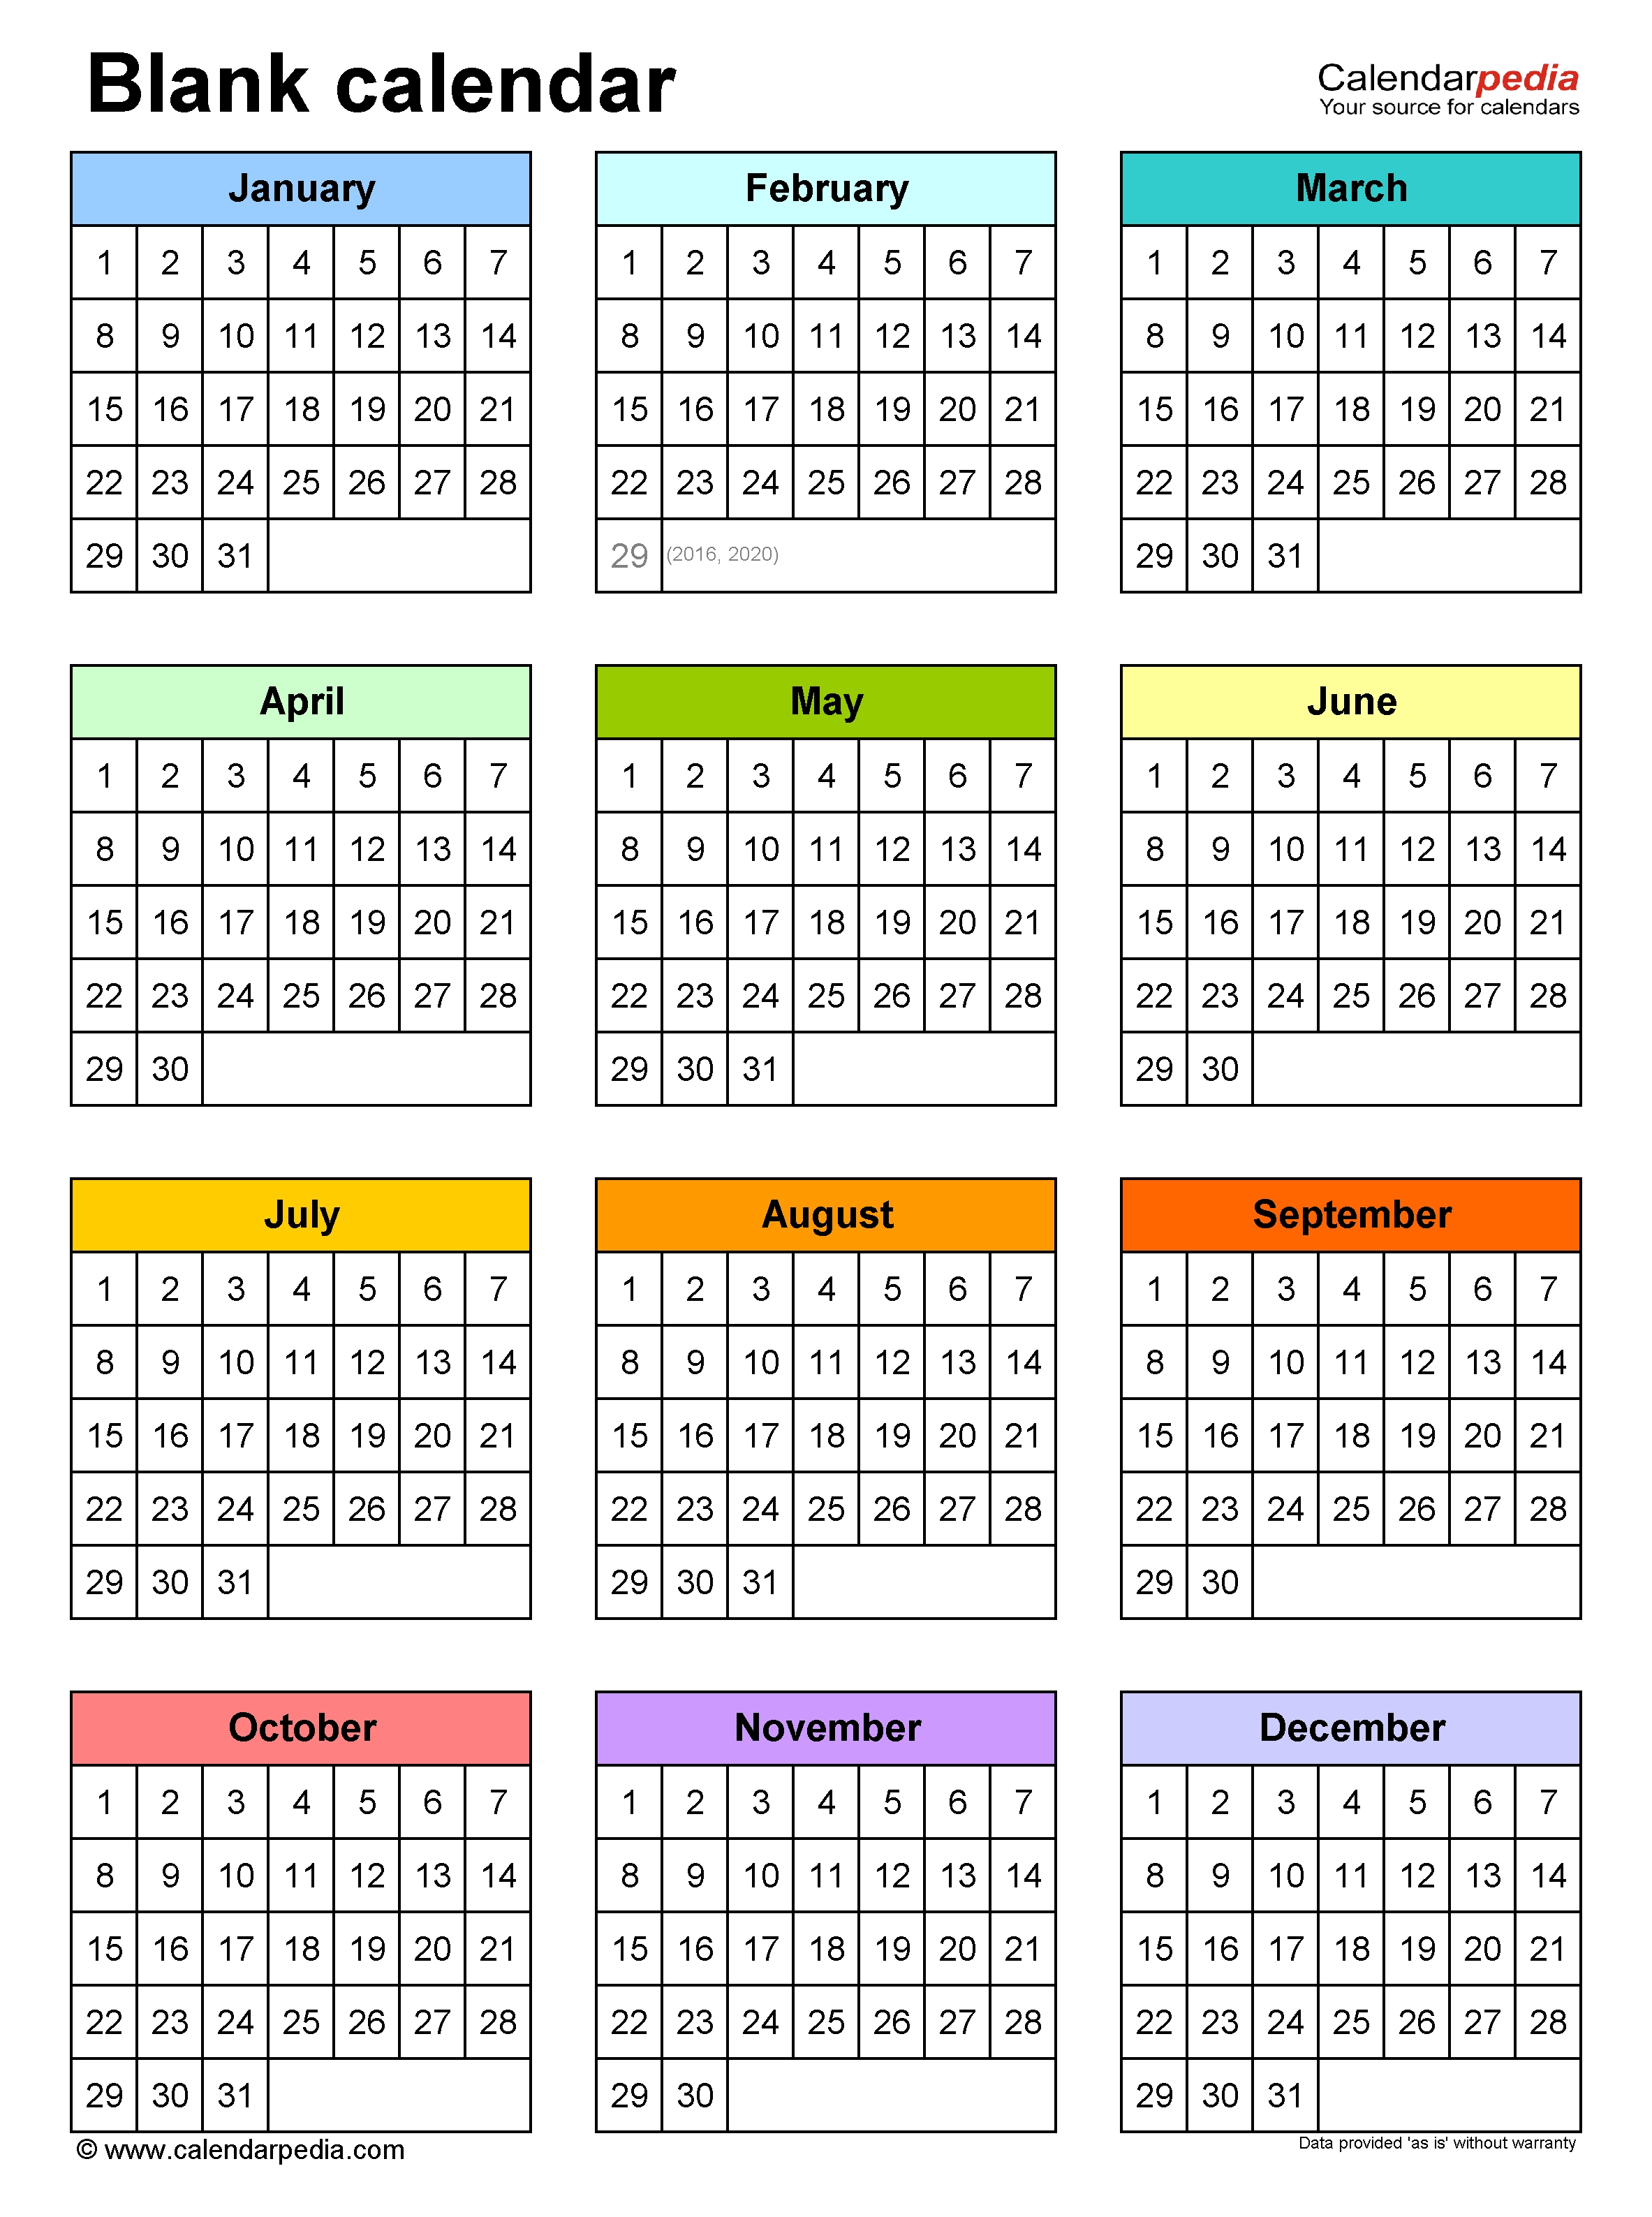 Blank Calendars - Free Printable Microsoft Word Templates Calendar Template Microsoft Word